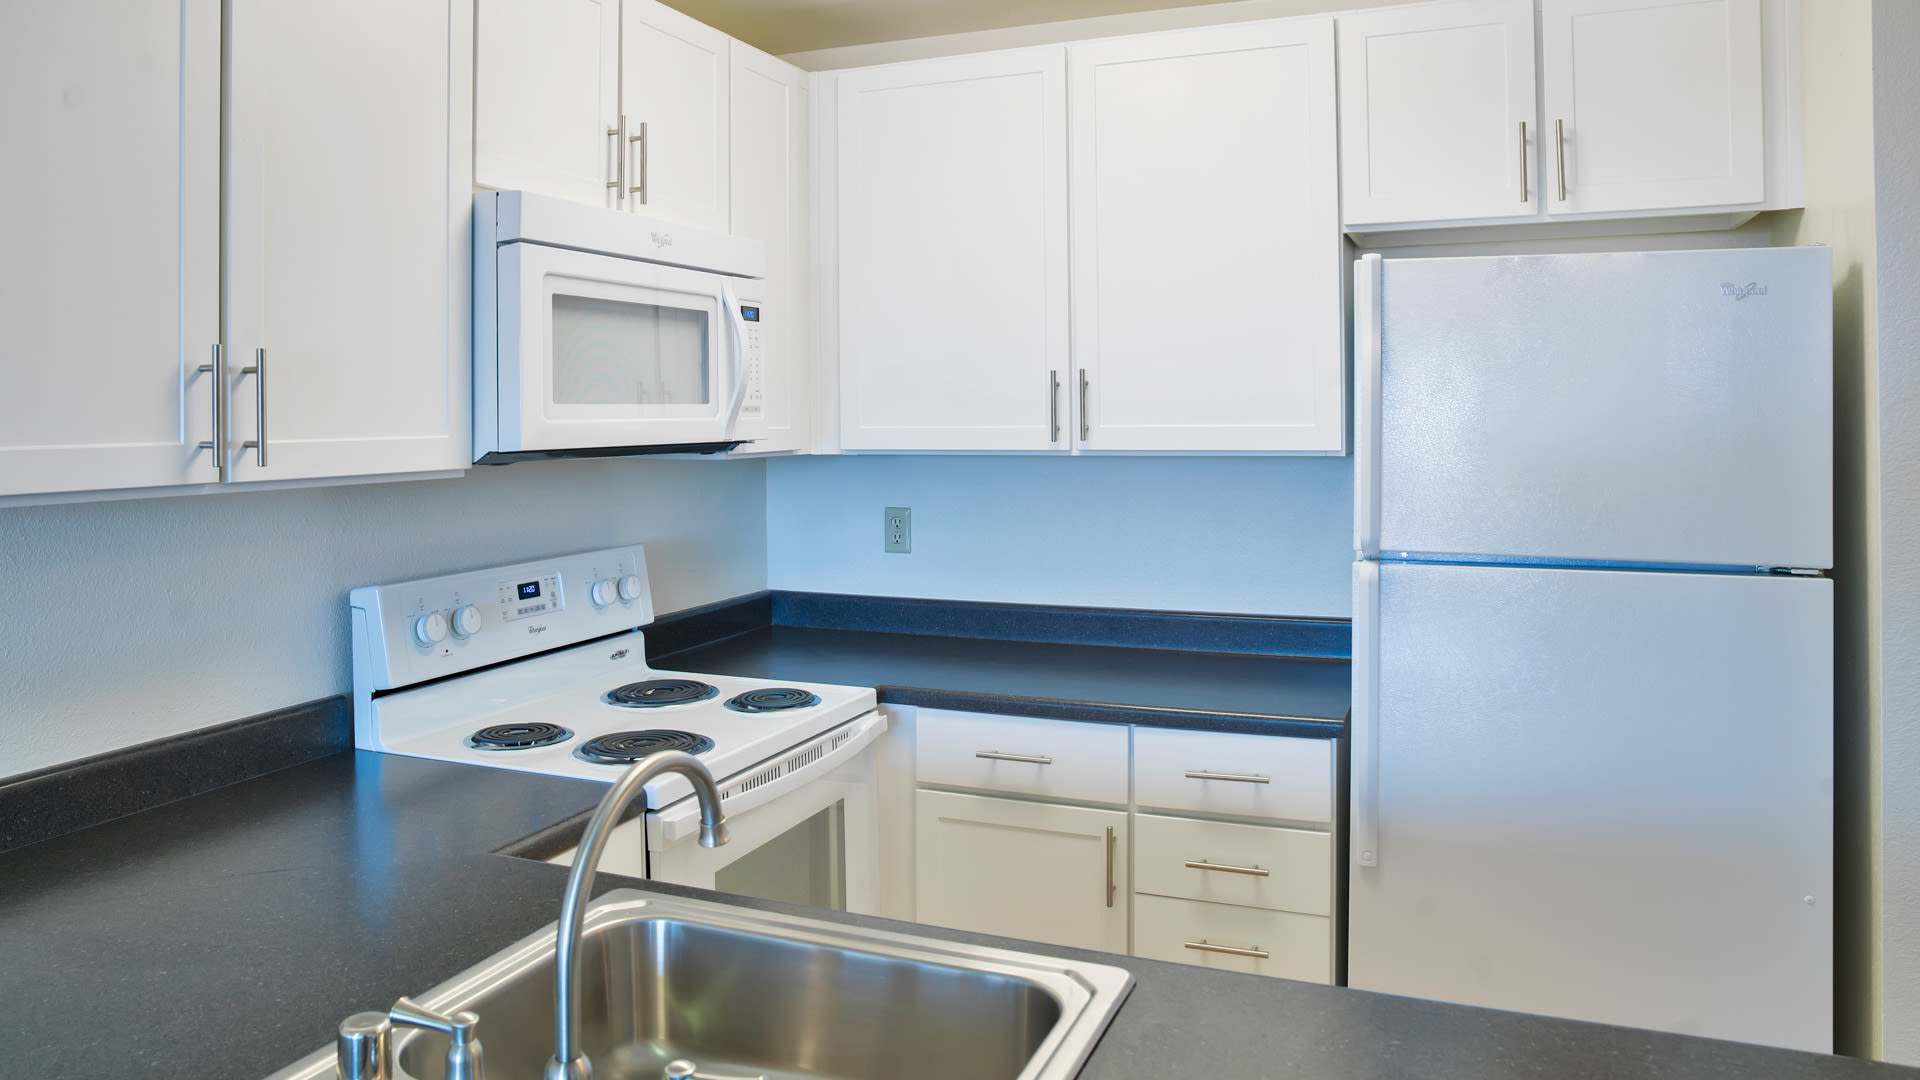 Park West Apartments reviews in Westchester - 9400 La Tijera Blvd ...